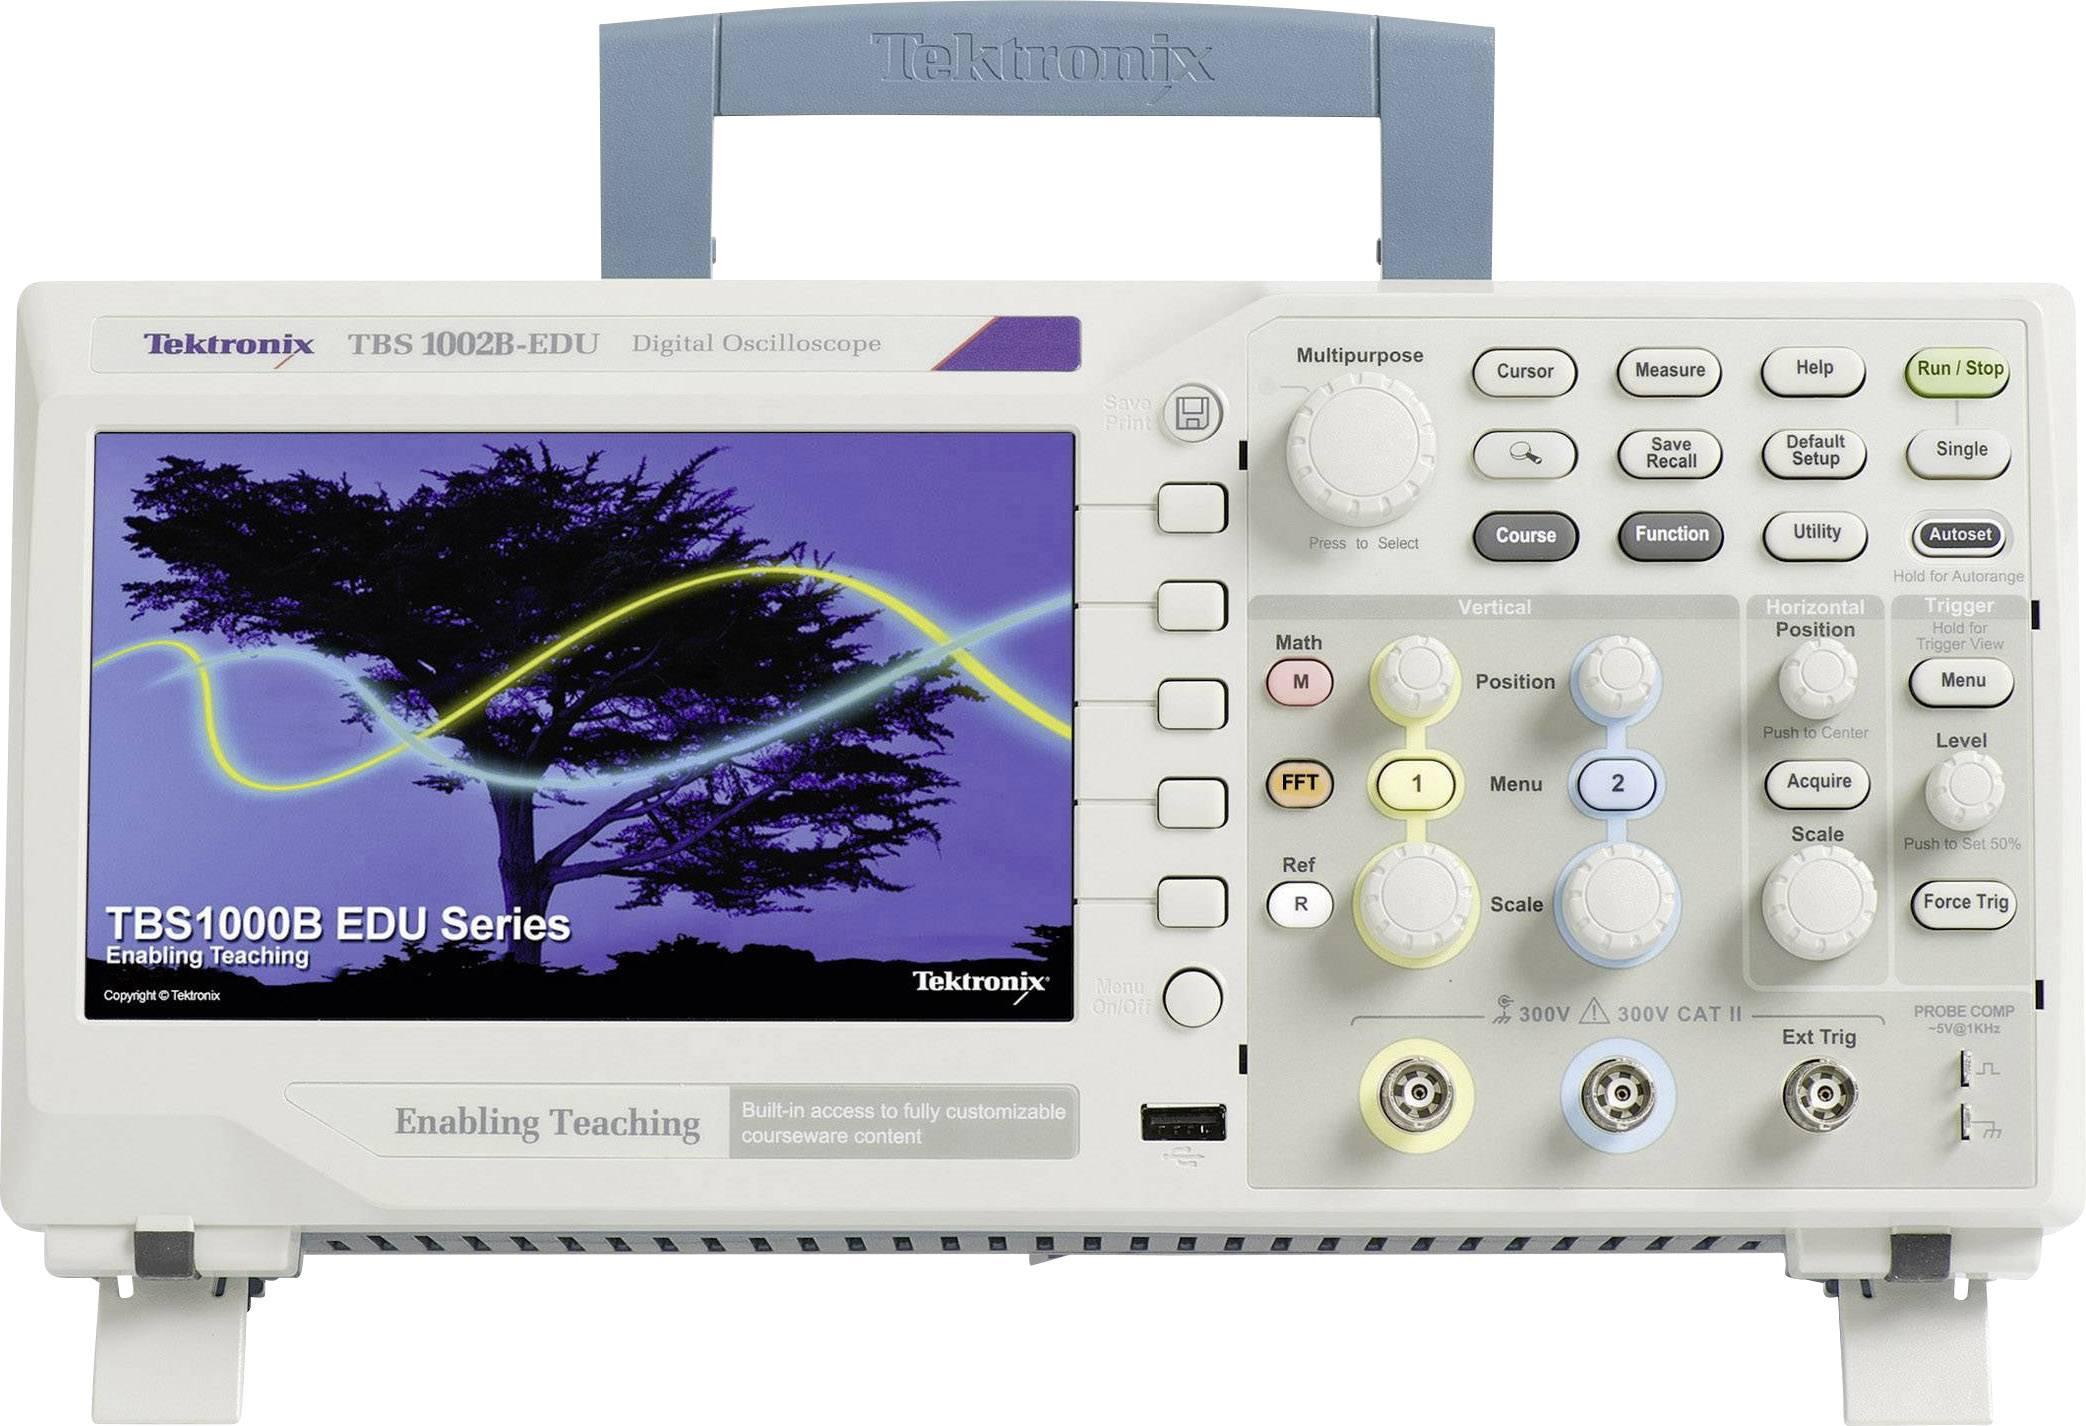 Digitálny osciloskop Tektronix TBS1052B-EDU, 50 MHz, 2-kanálový, kalibrácia podľa ISO